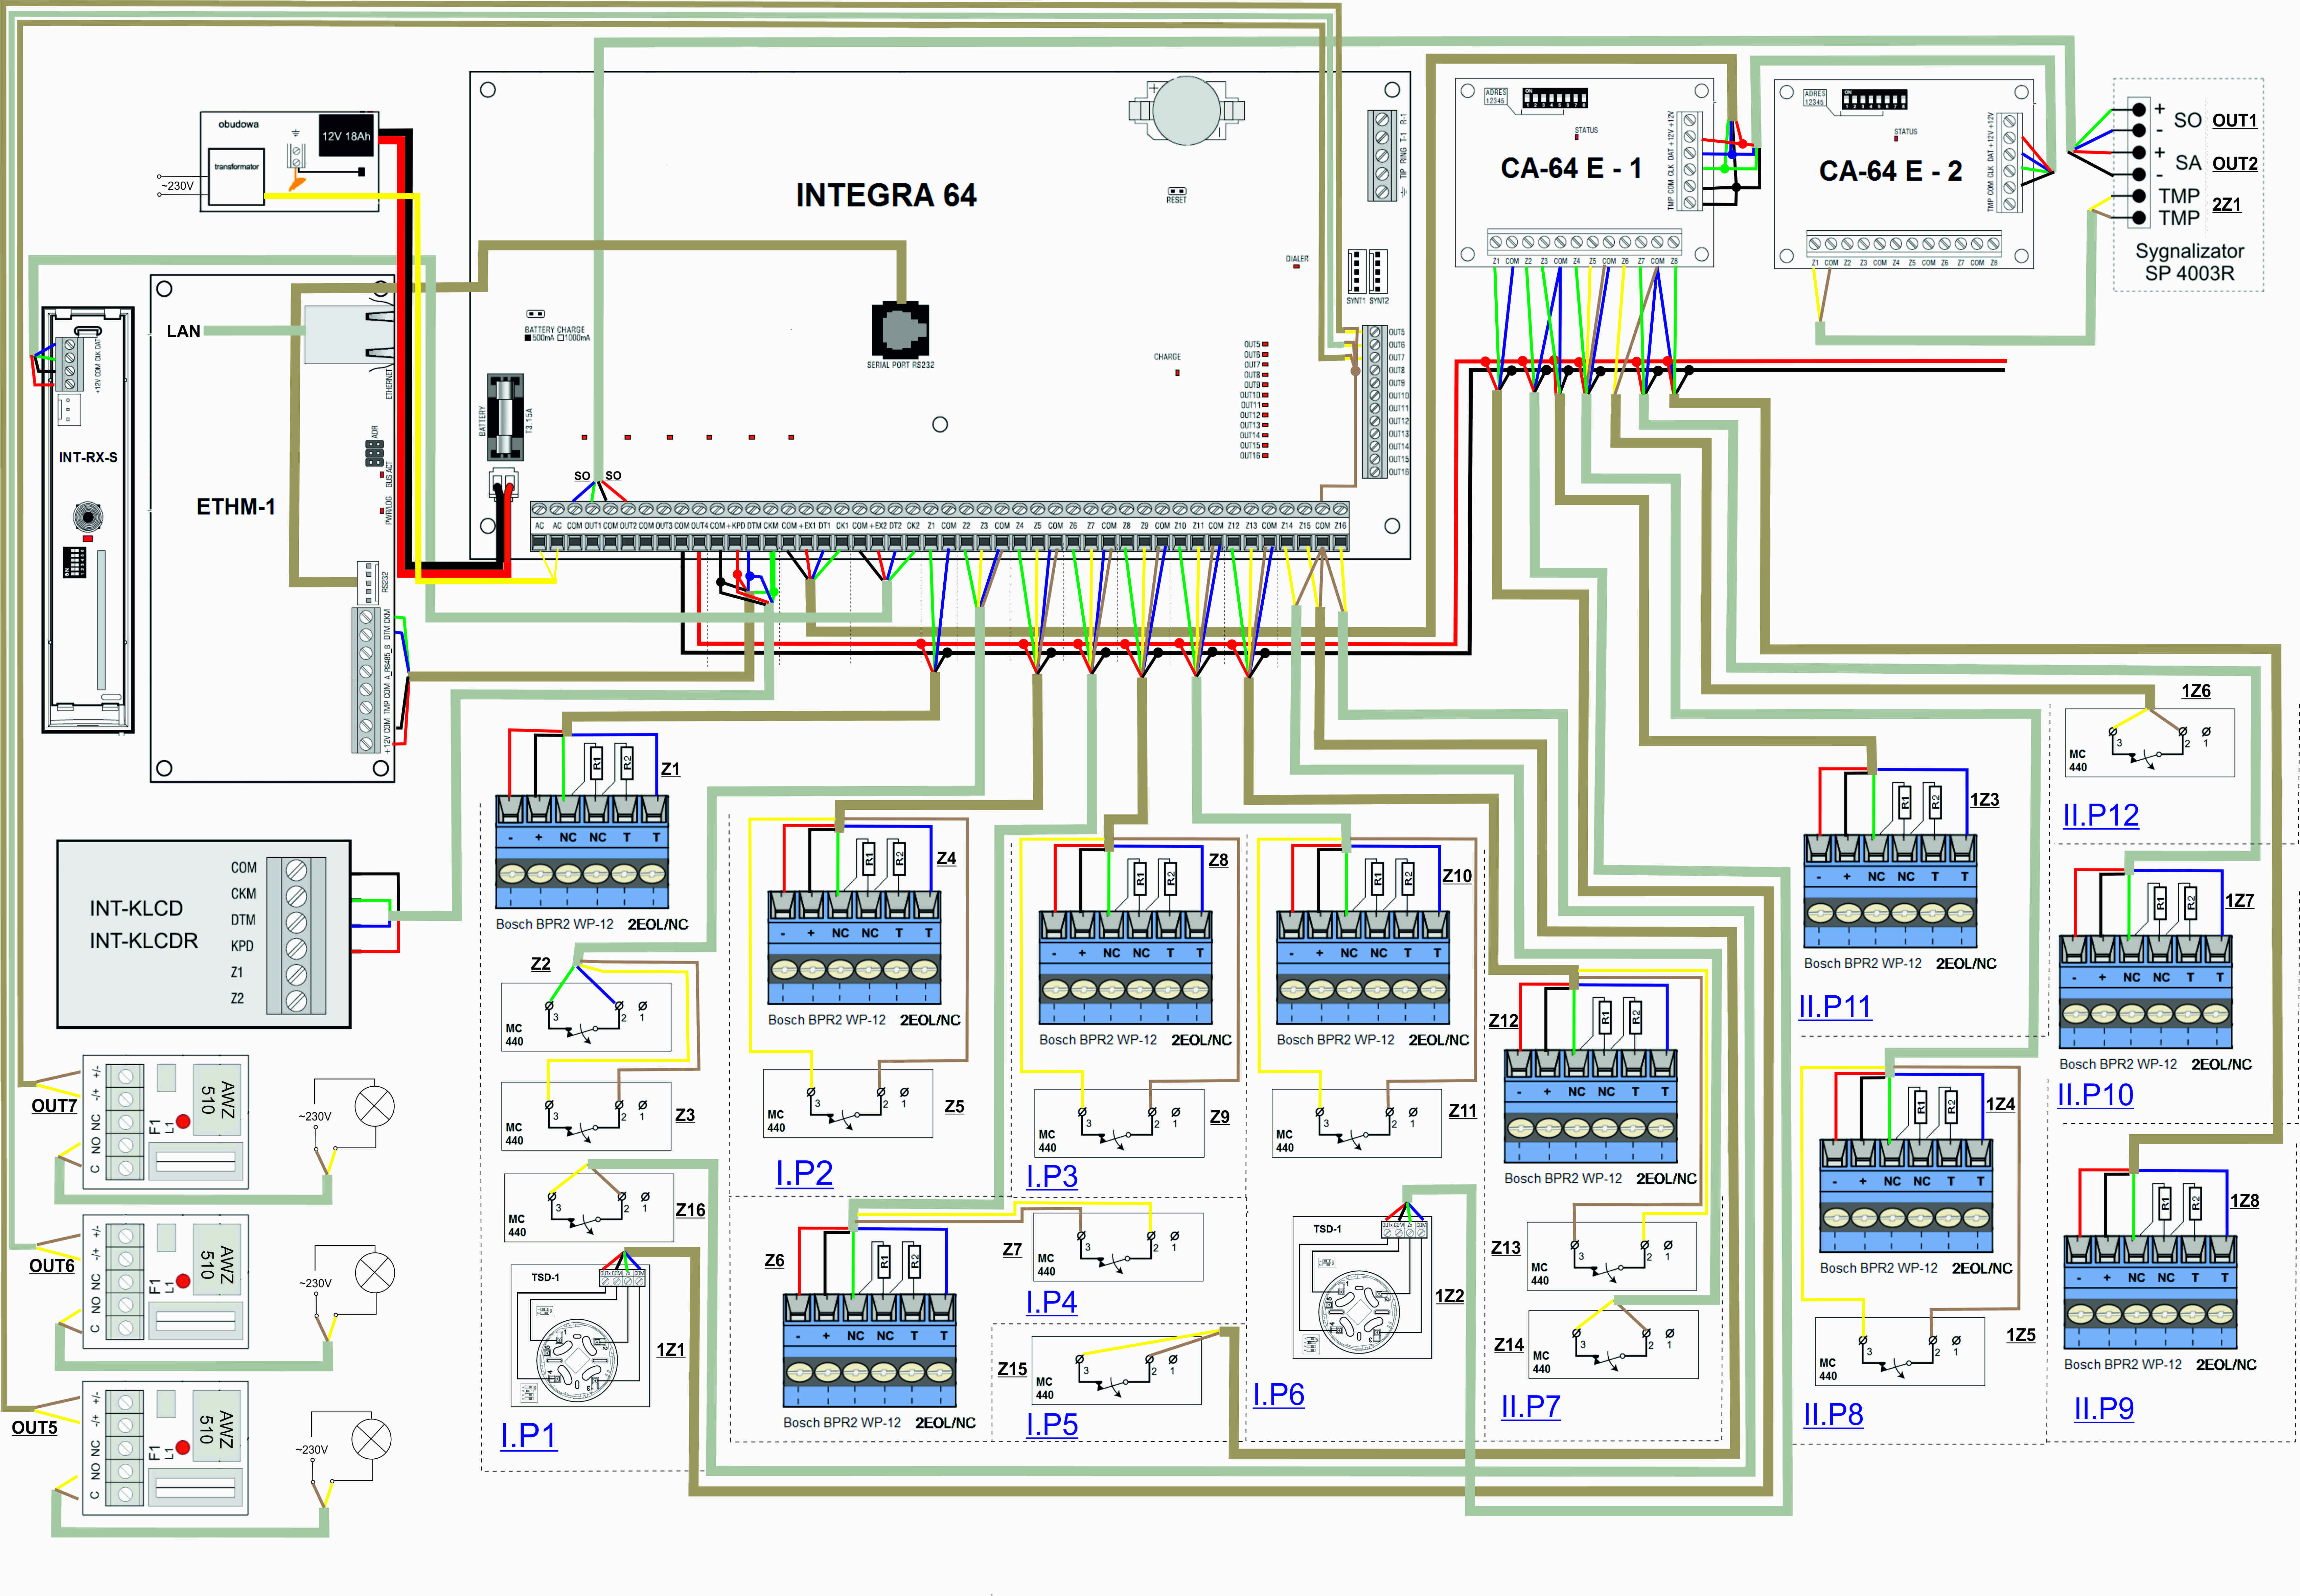 Satel Integra 64 ETHM-1 - zaopiniowanie schematu